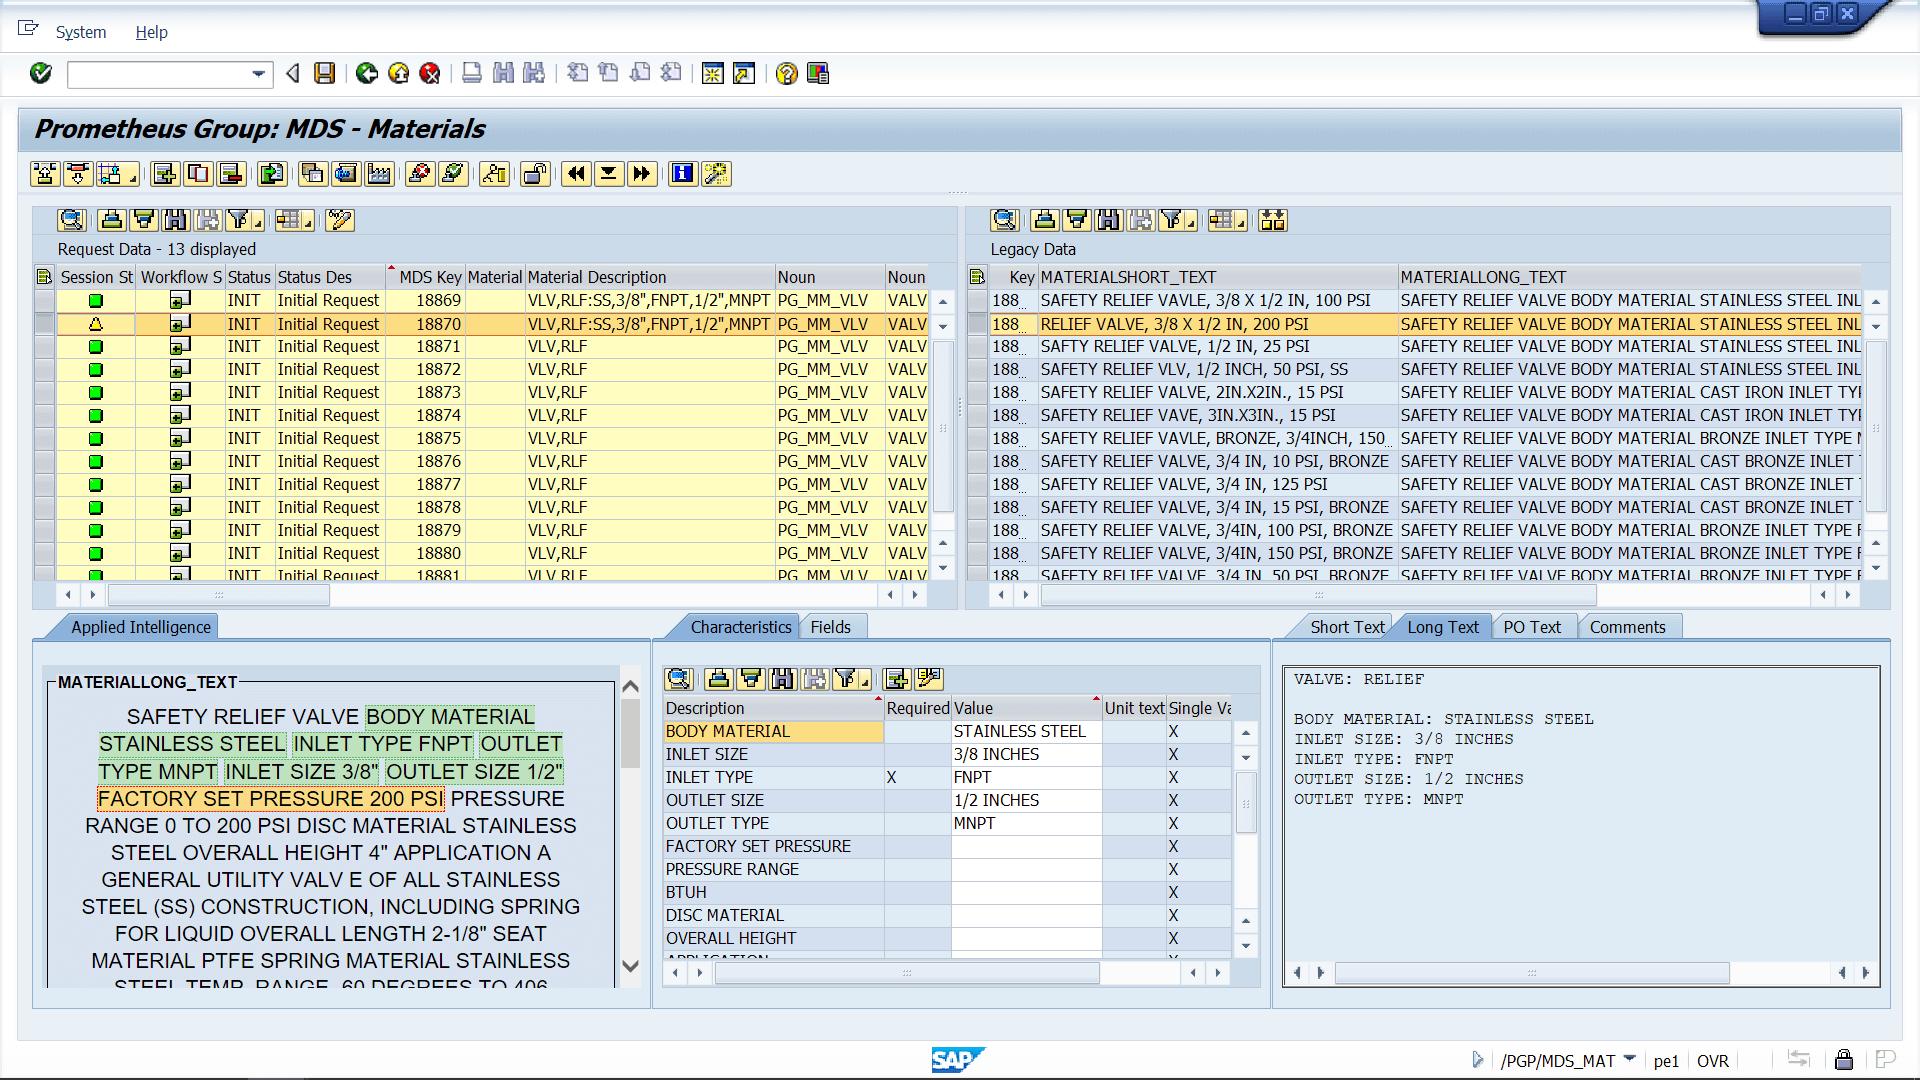 Prometheus Platform data governance dashboard